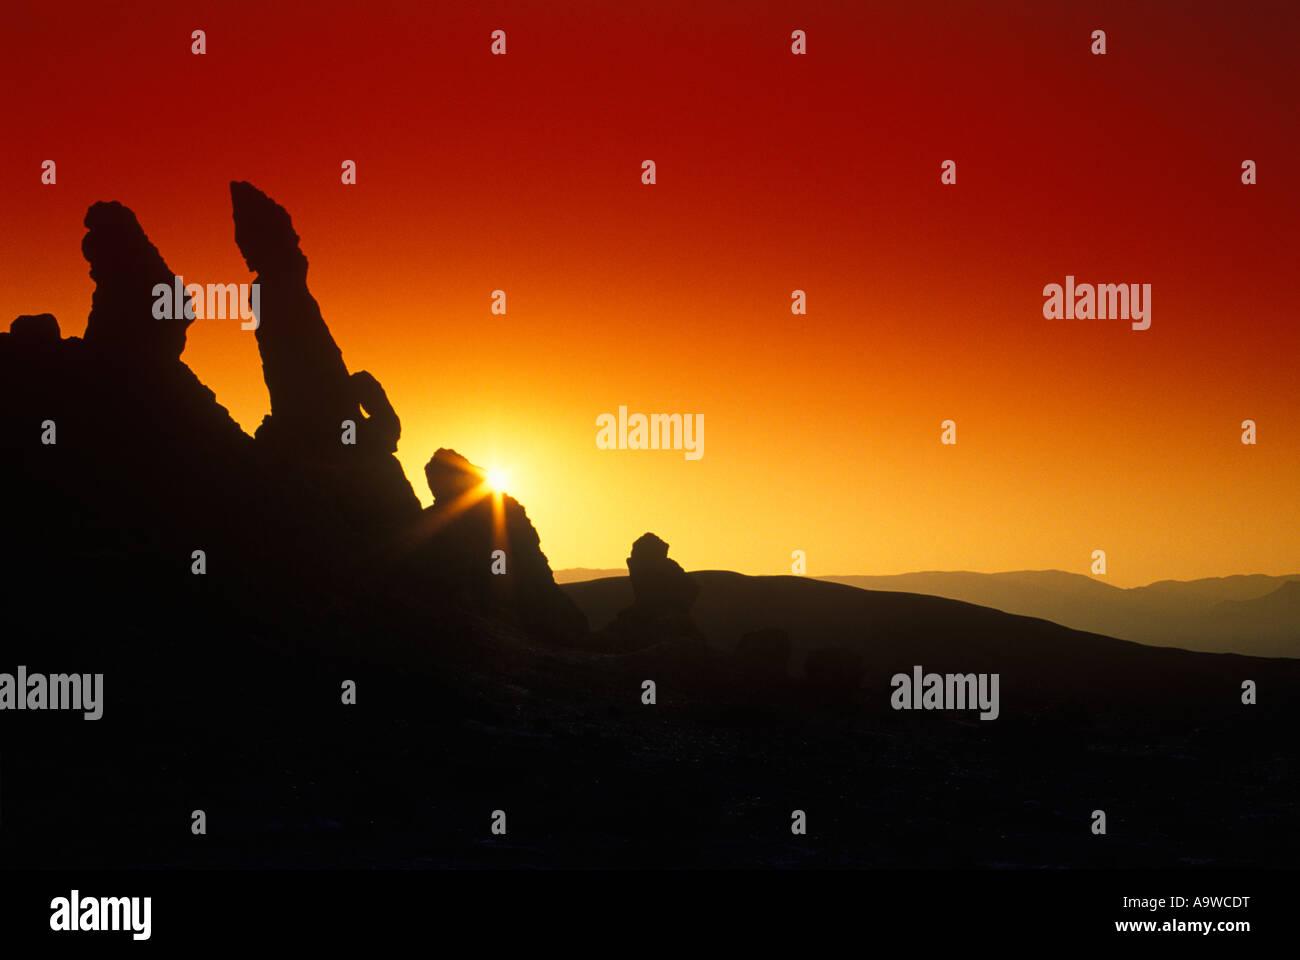 3 MARIAS ROCK FORMAZIONE VALLE DE LA LUNA NEL DESERTO DI ATACAMA San Pedro de Atacama II REGIONE DEL CILE Immagini Stock